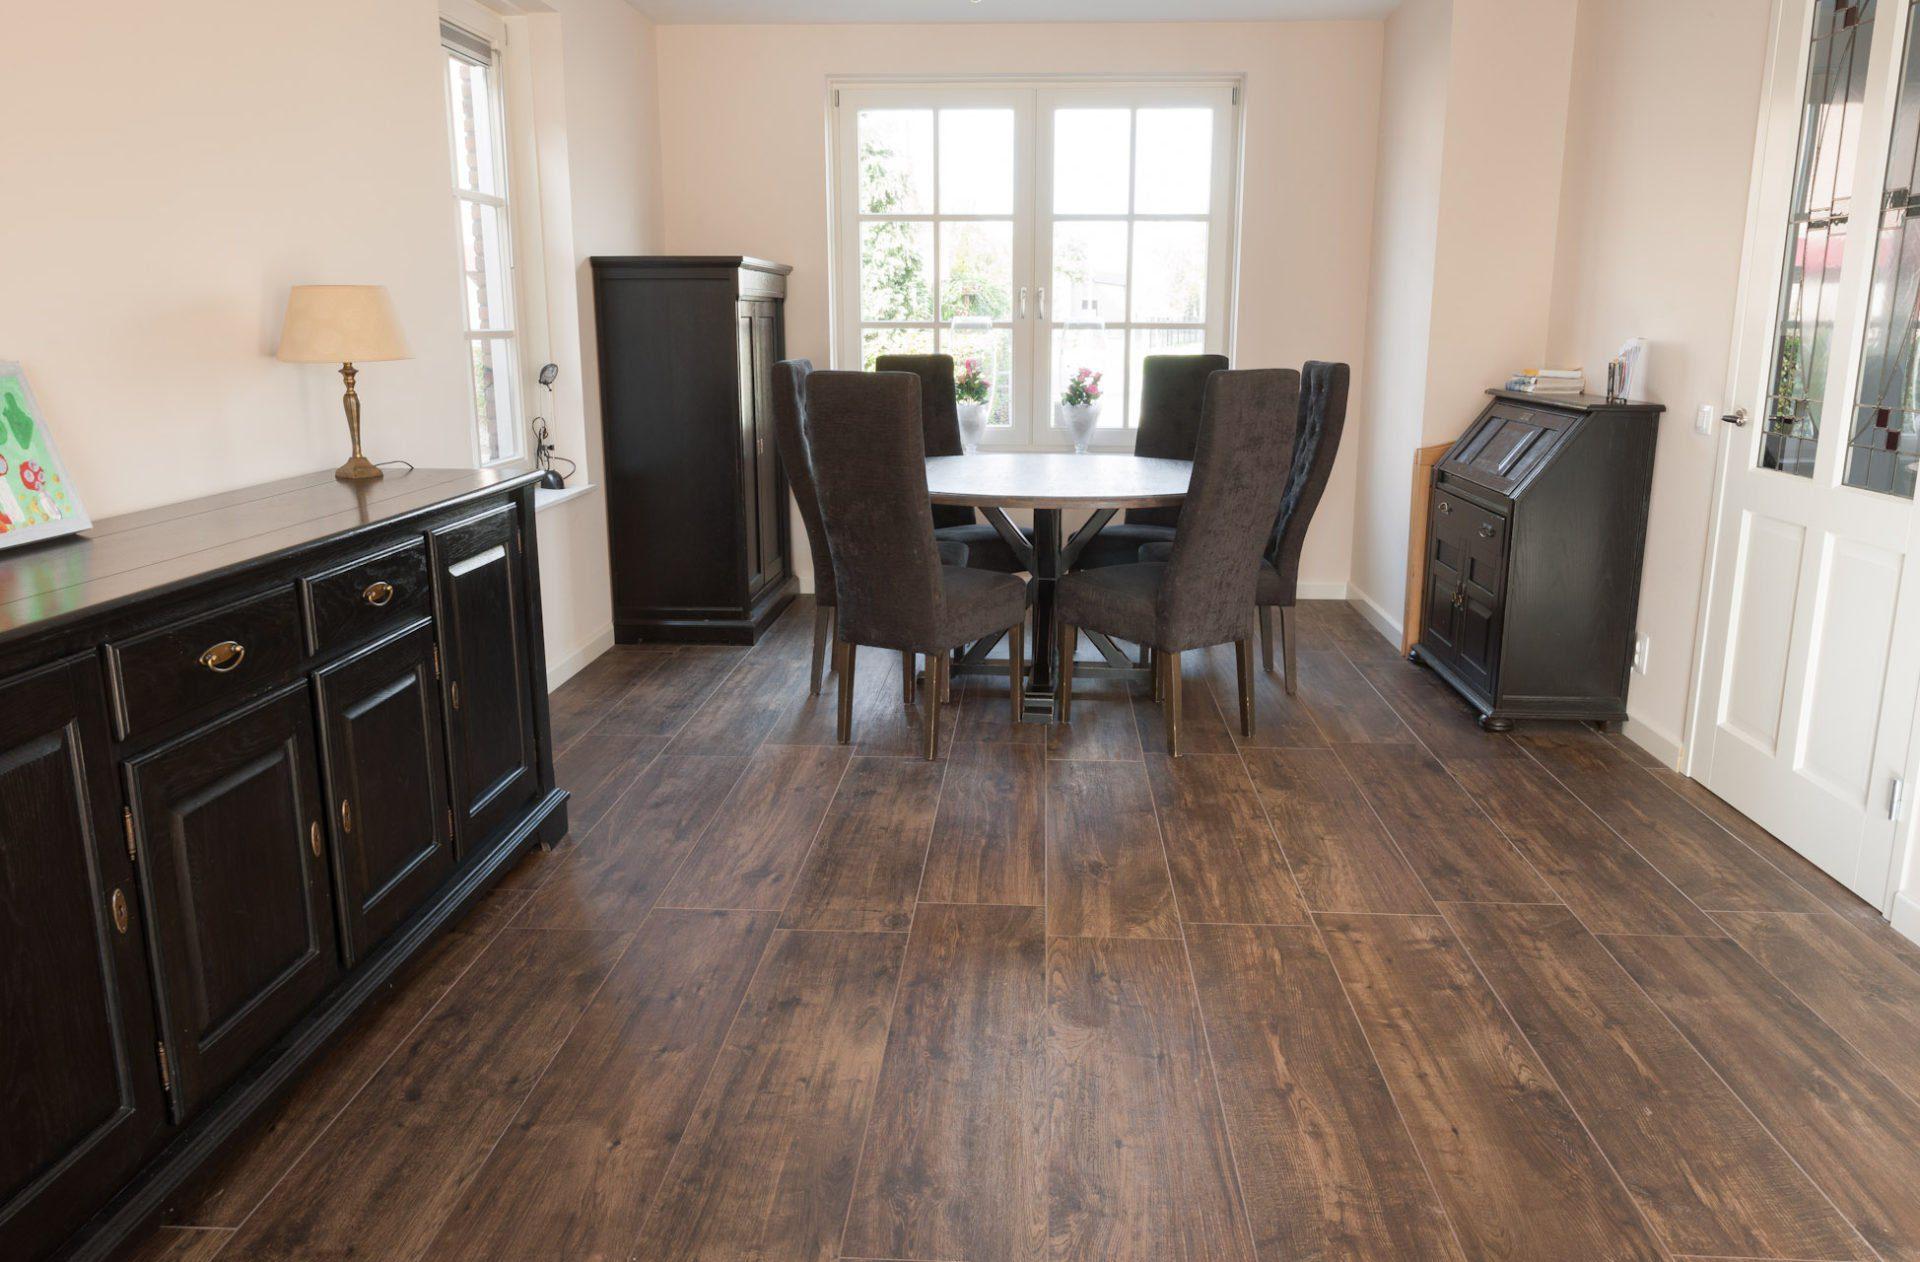 Woonkamer Ideeen Bruin : Vloertegels woonkamer kroon vloeren in steen